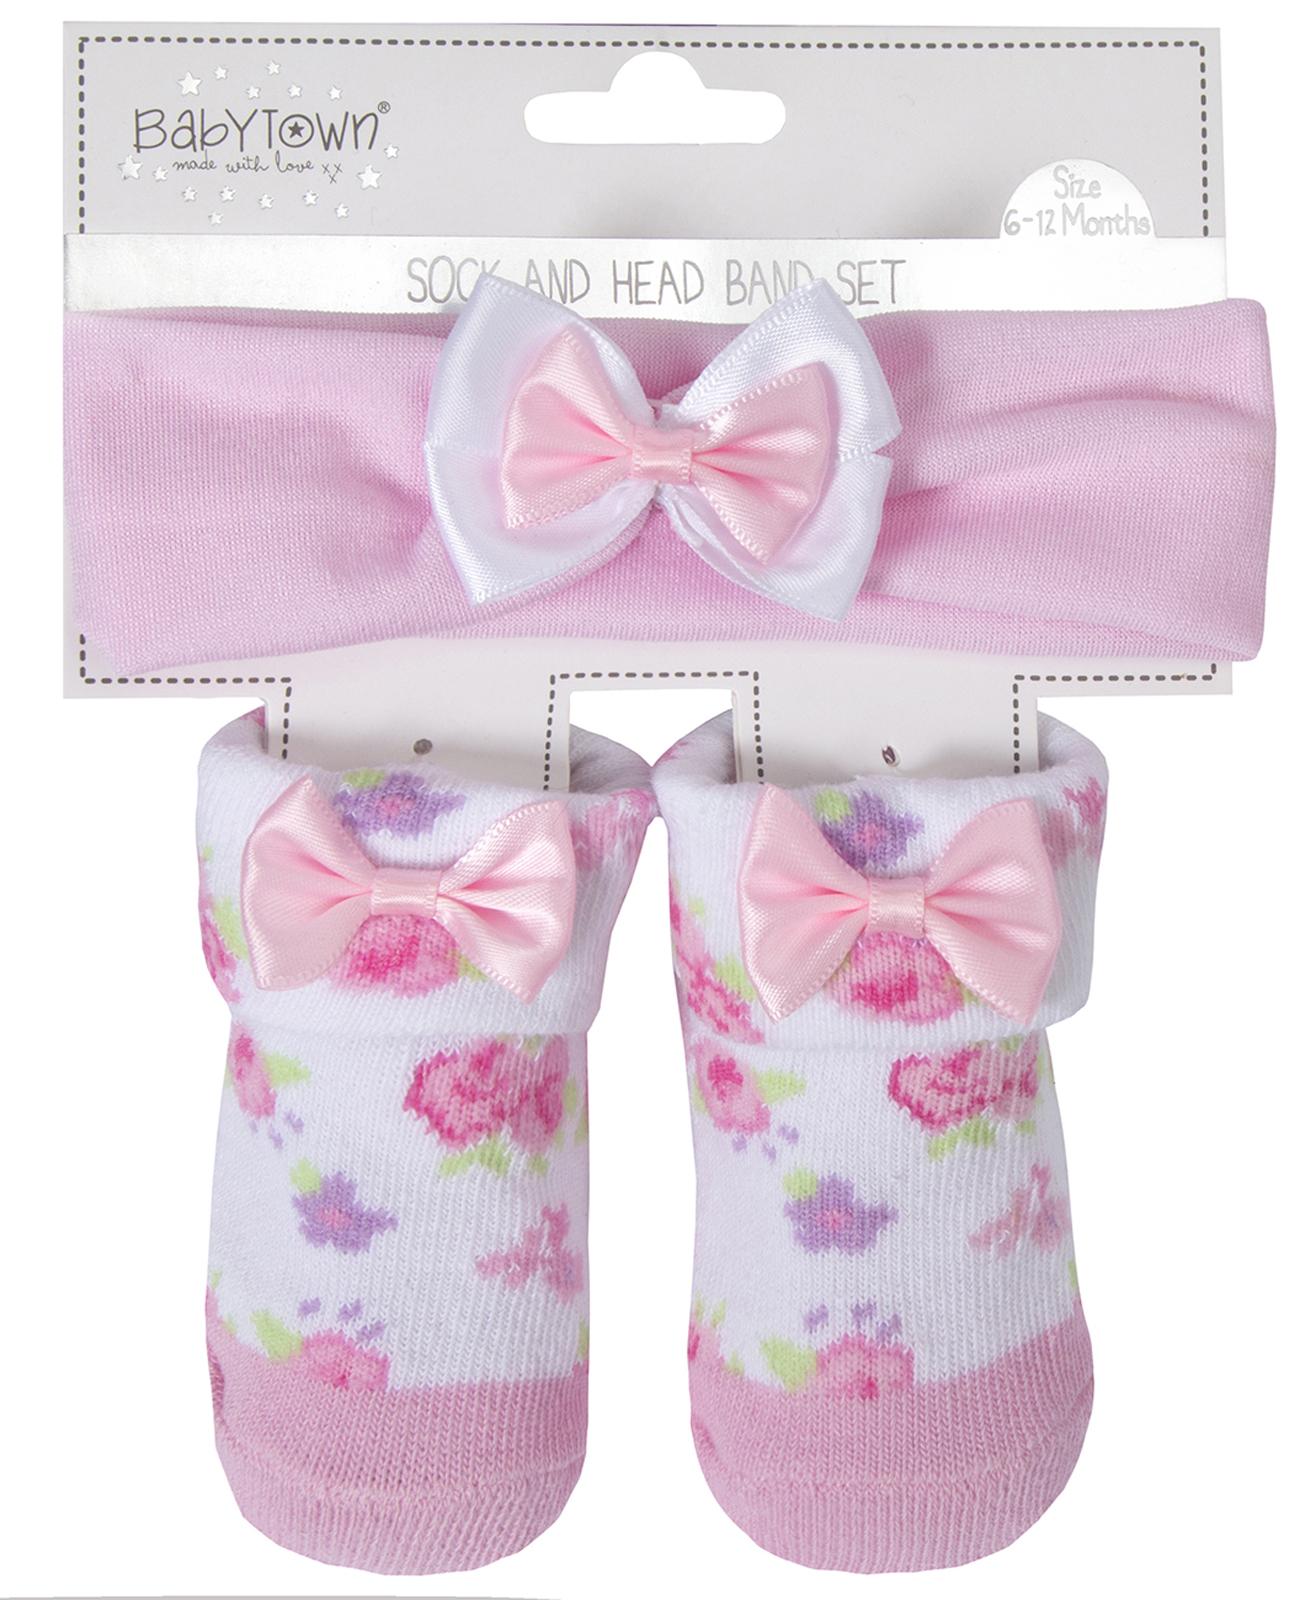 0-6 Months Baby Girl Headband And Socks Cutie Baby